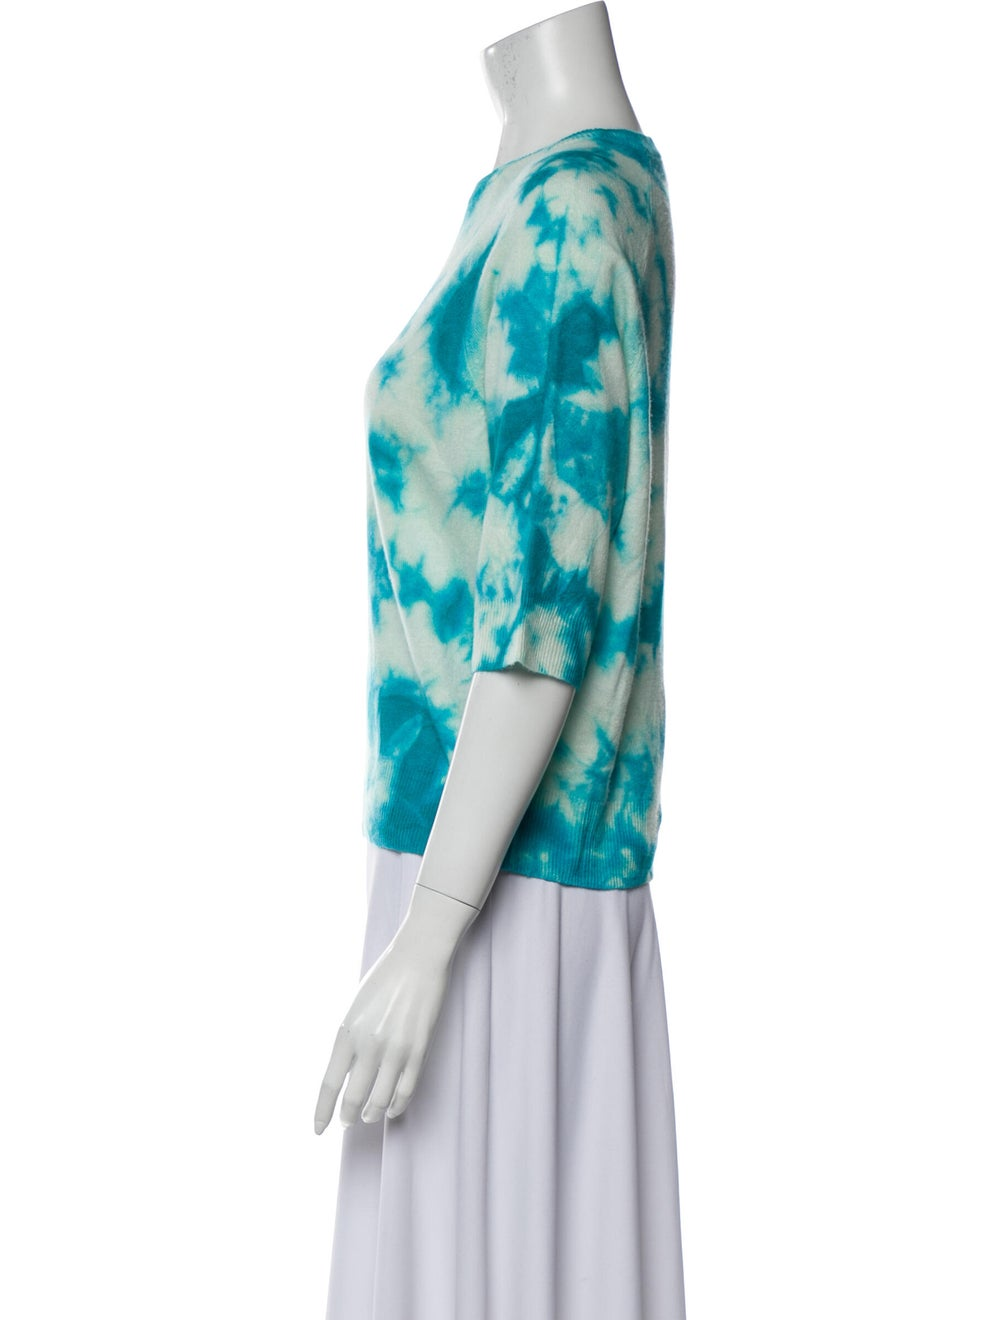 Michael Kors Cashmere Tie-Dye Print Sweater Blue - image 2